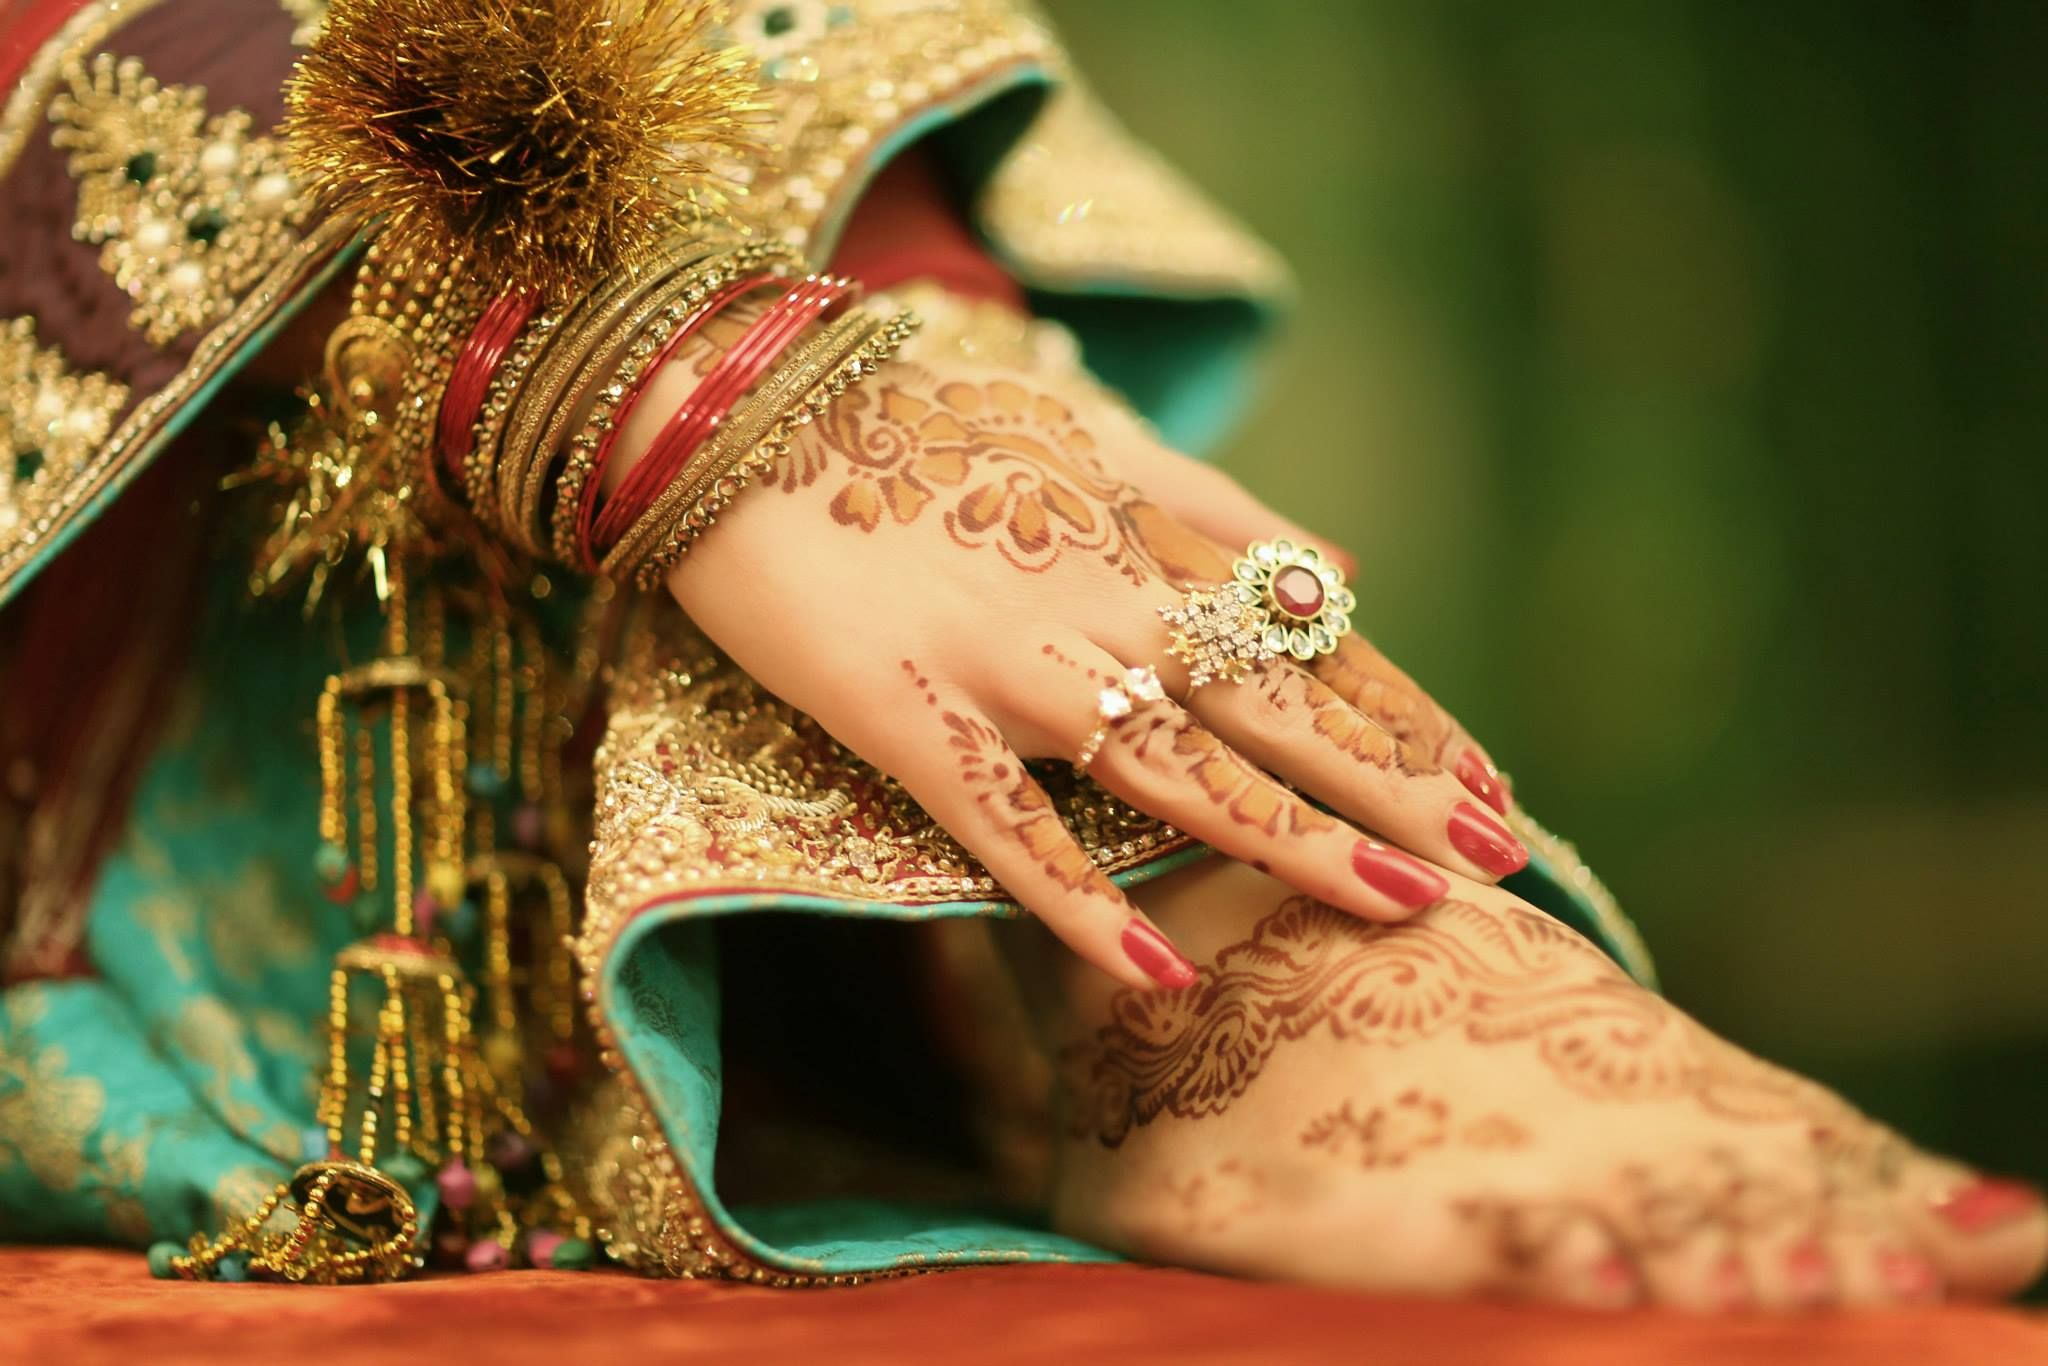 Bridal Mehndi Rates In Karachi : Shahnawaz studio photography mix bridal hands